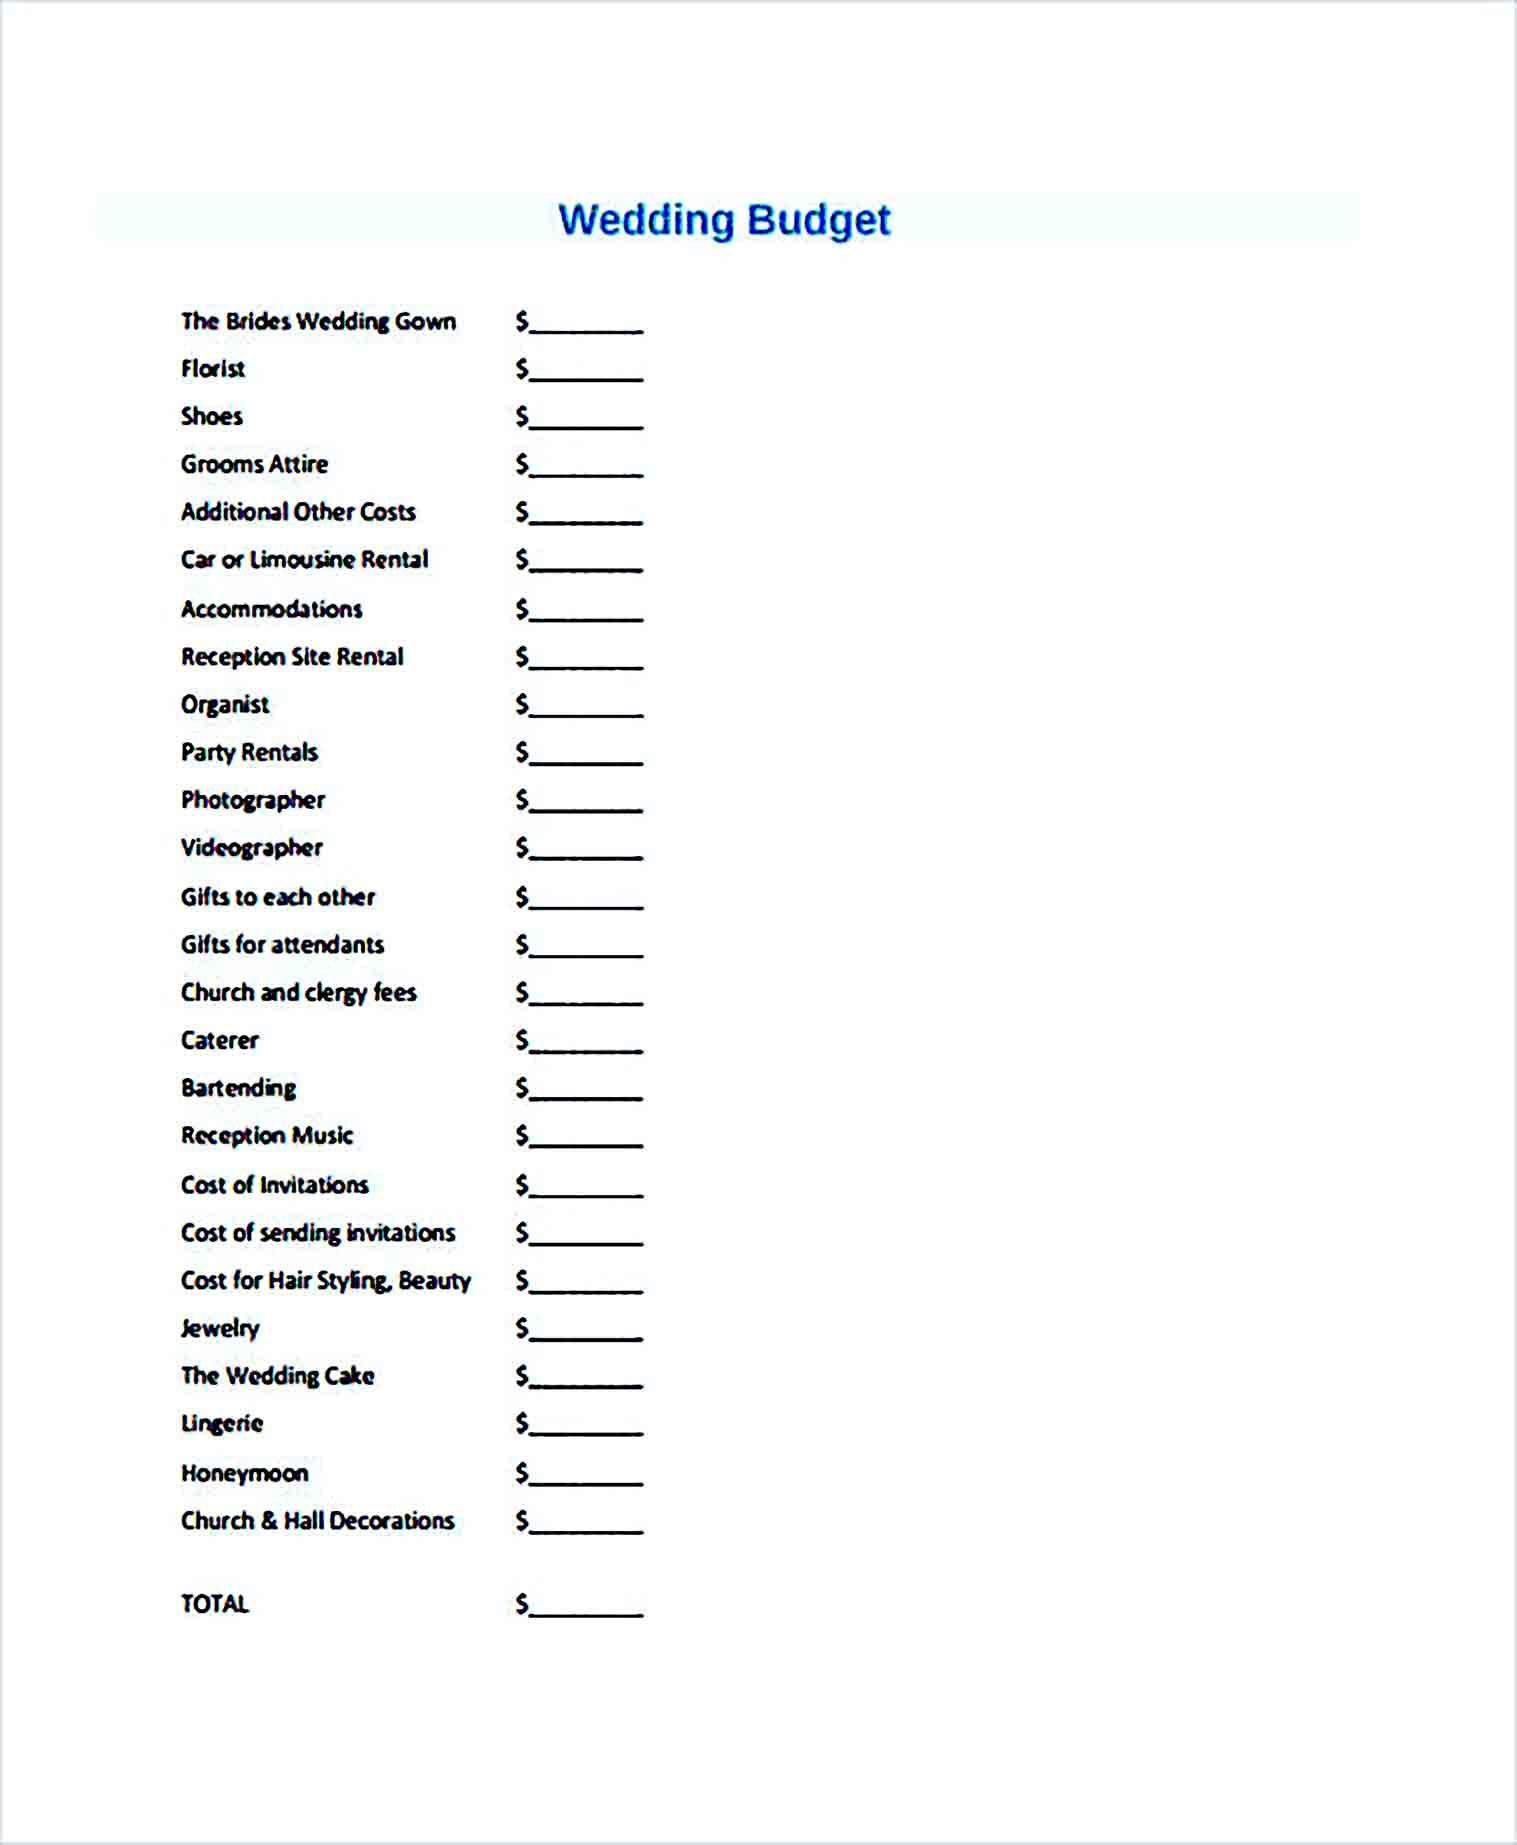 Sample Budget for Wedding 002